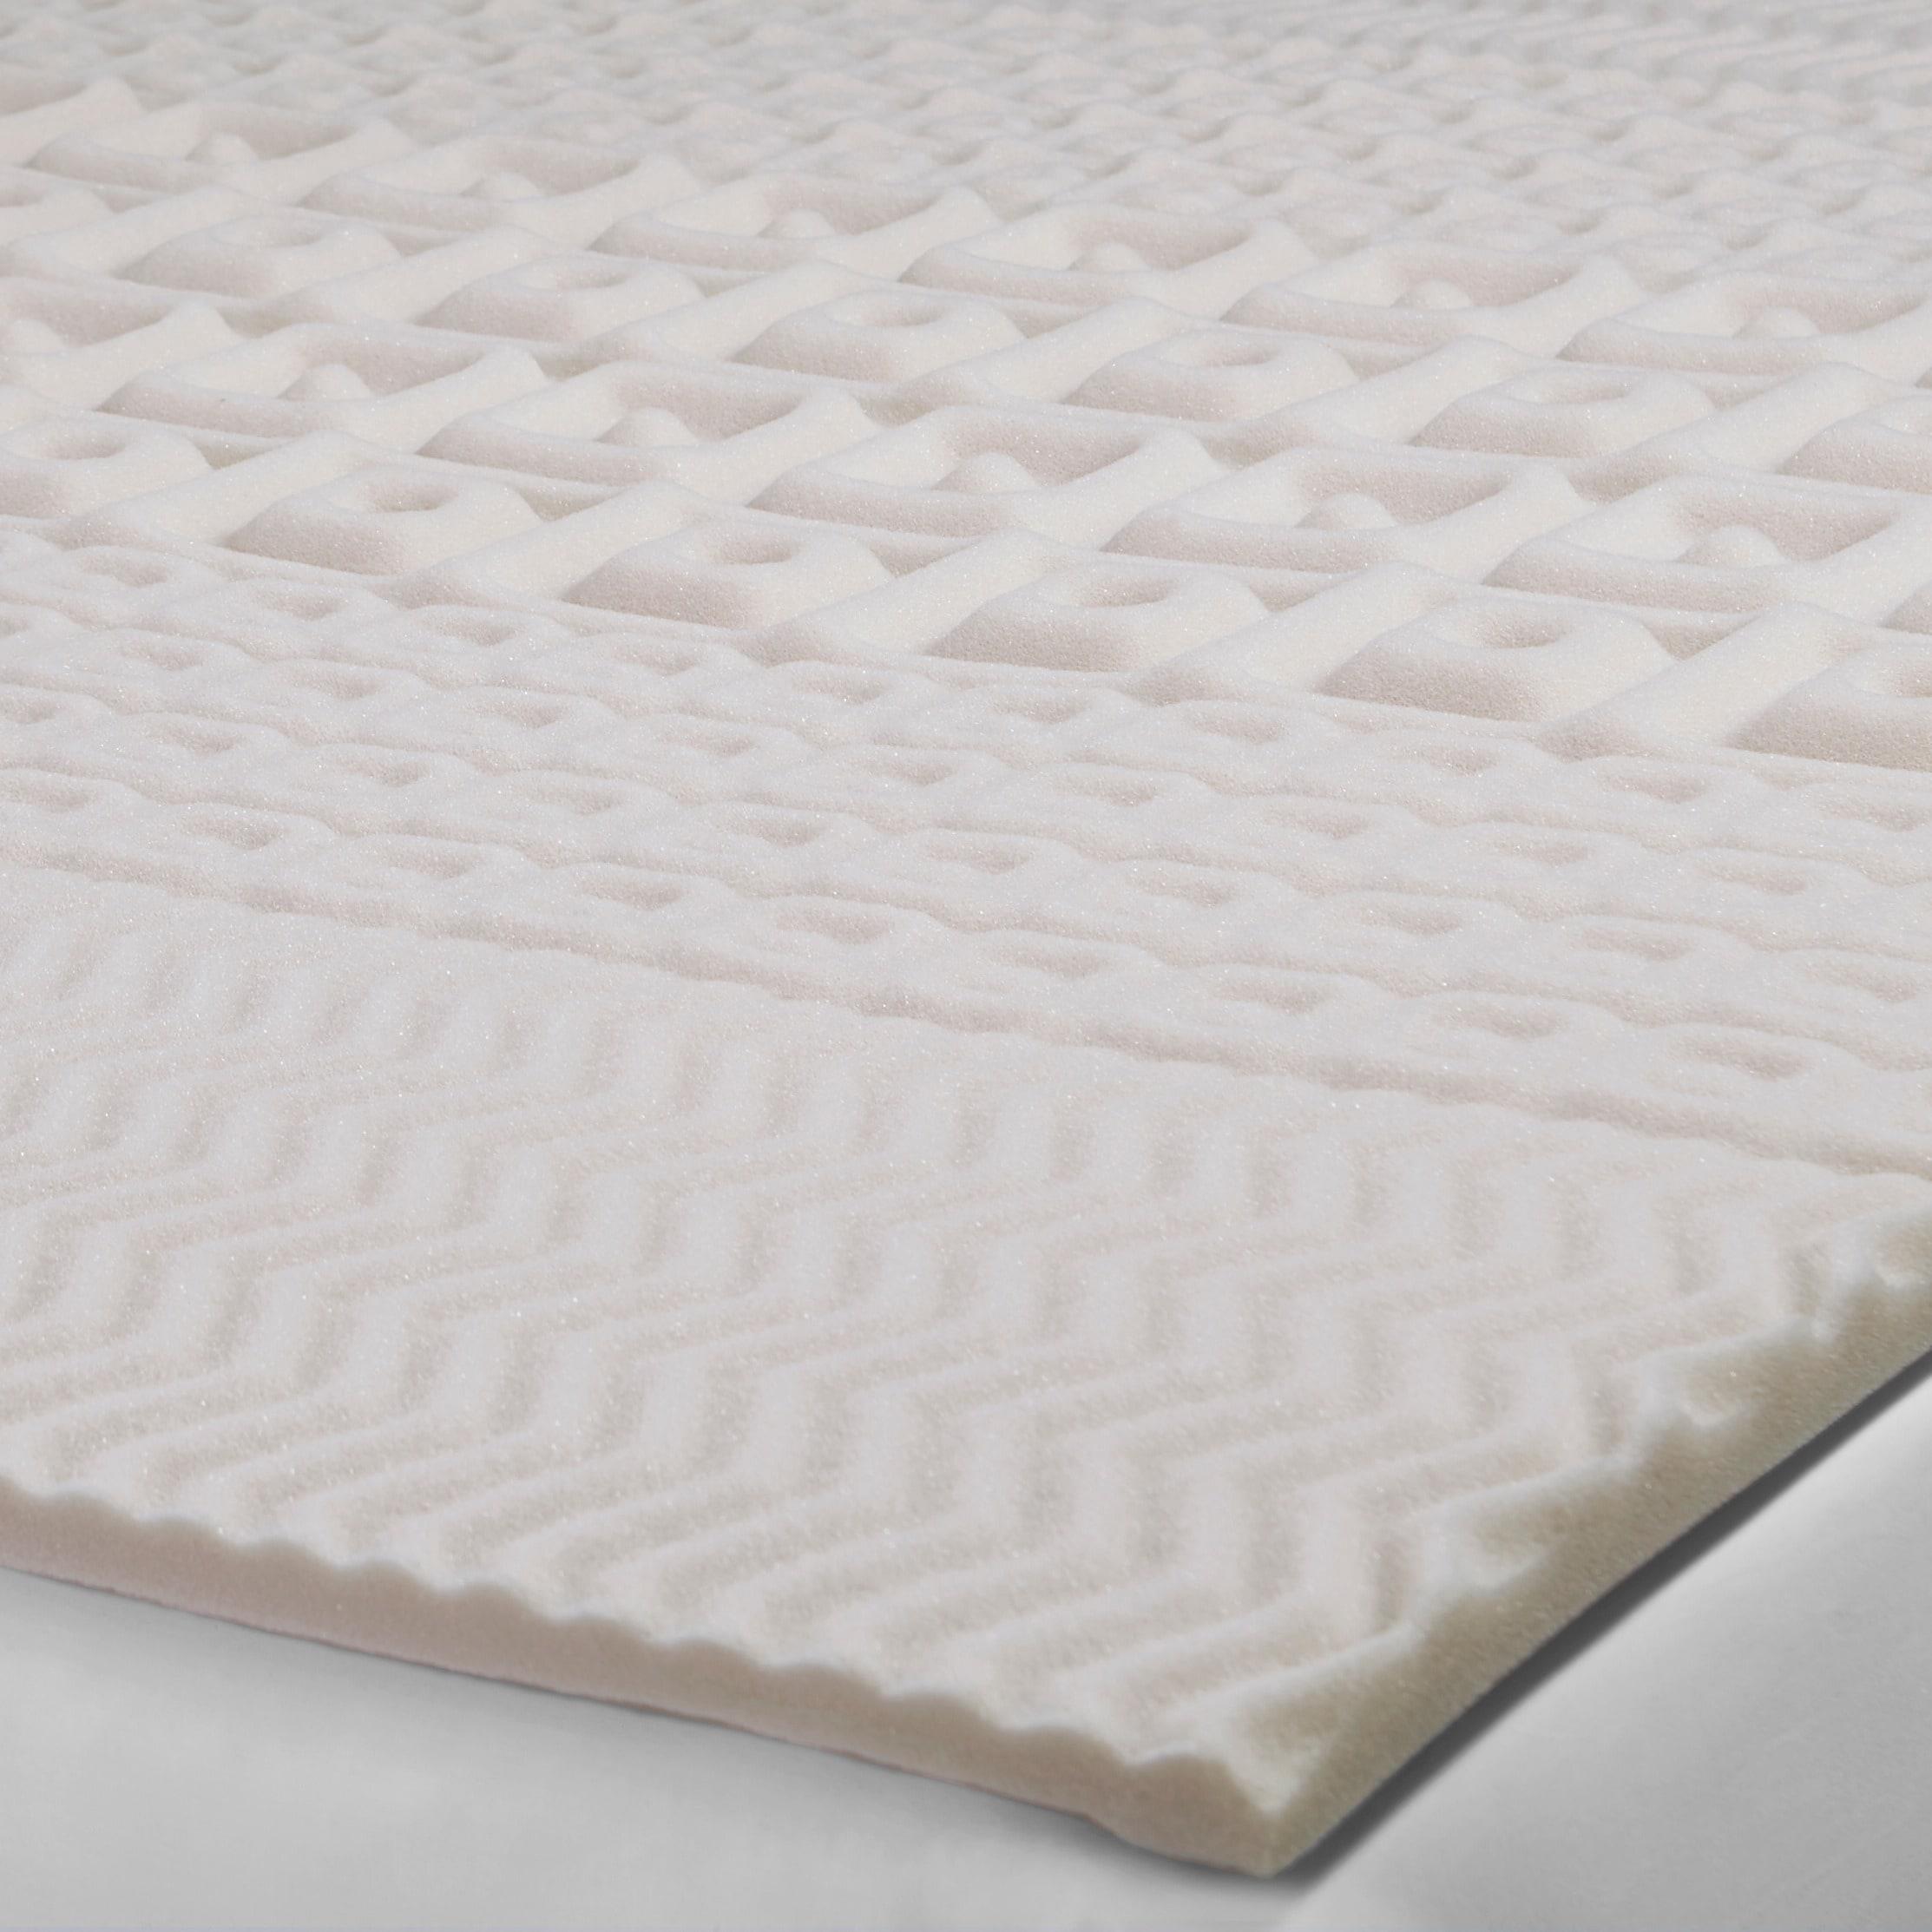 limited topper foam prd memory corry harry mattress